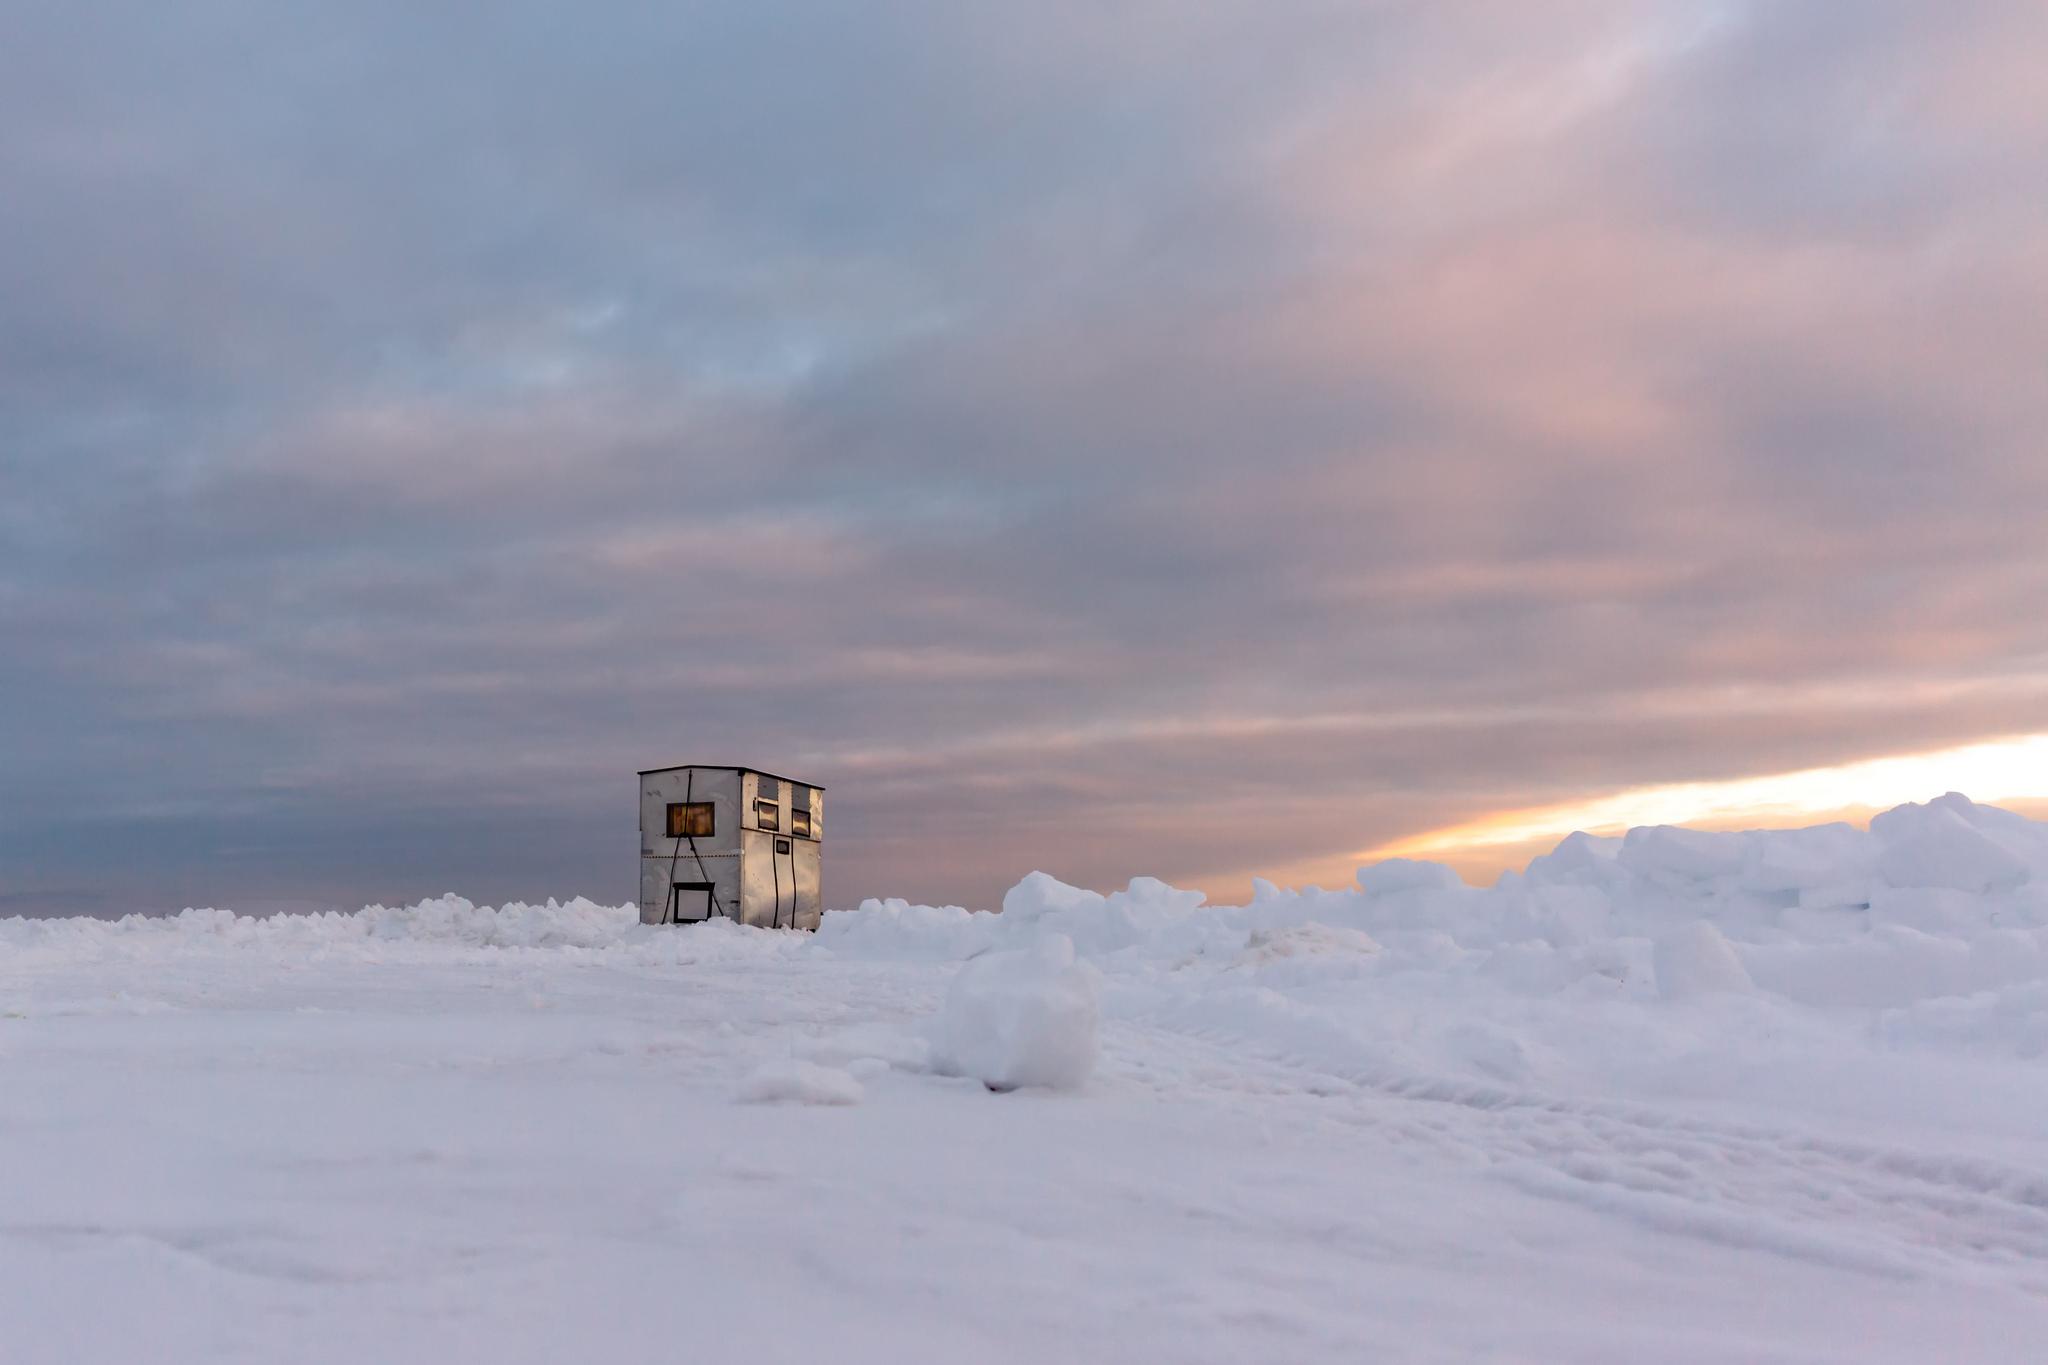 Ice fishing house at sunrise on Fishhook Lake in Park Rapids, Minnesota